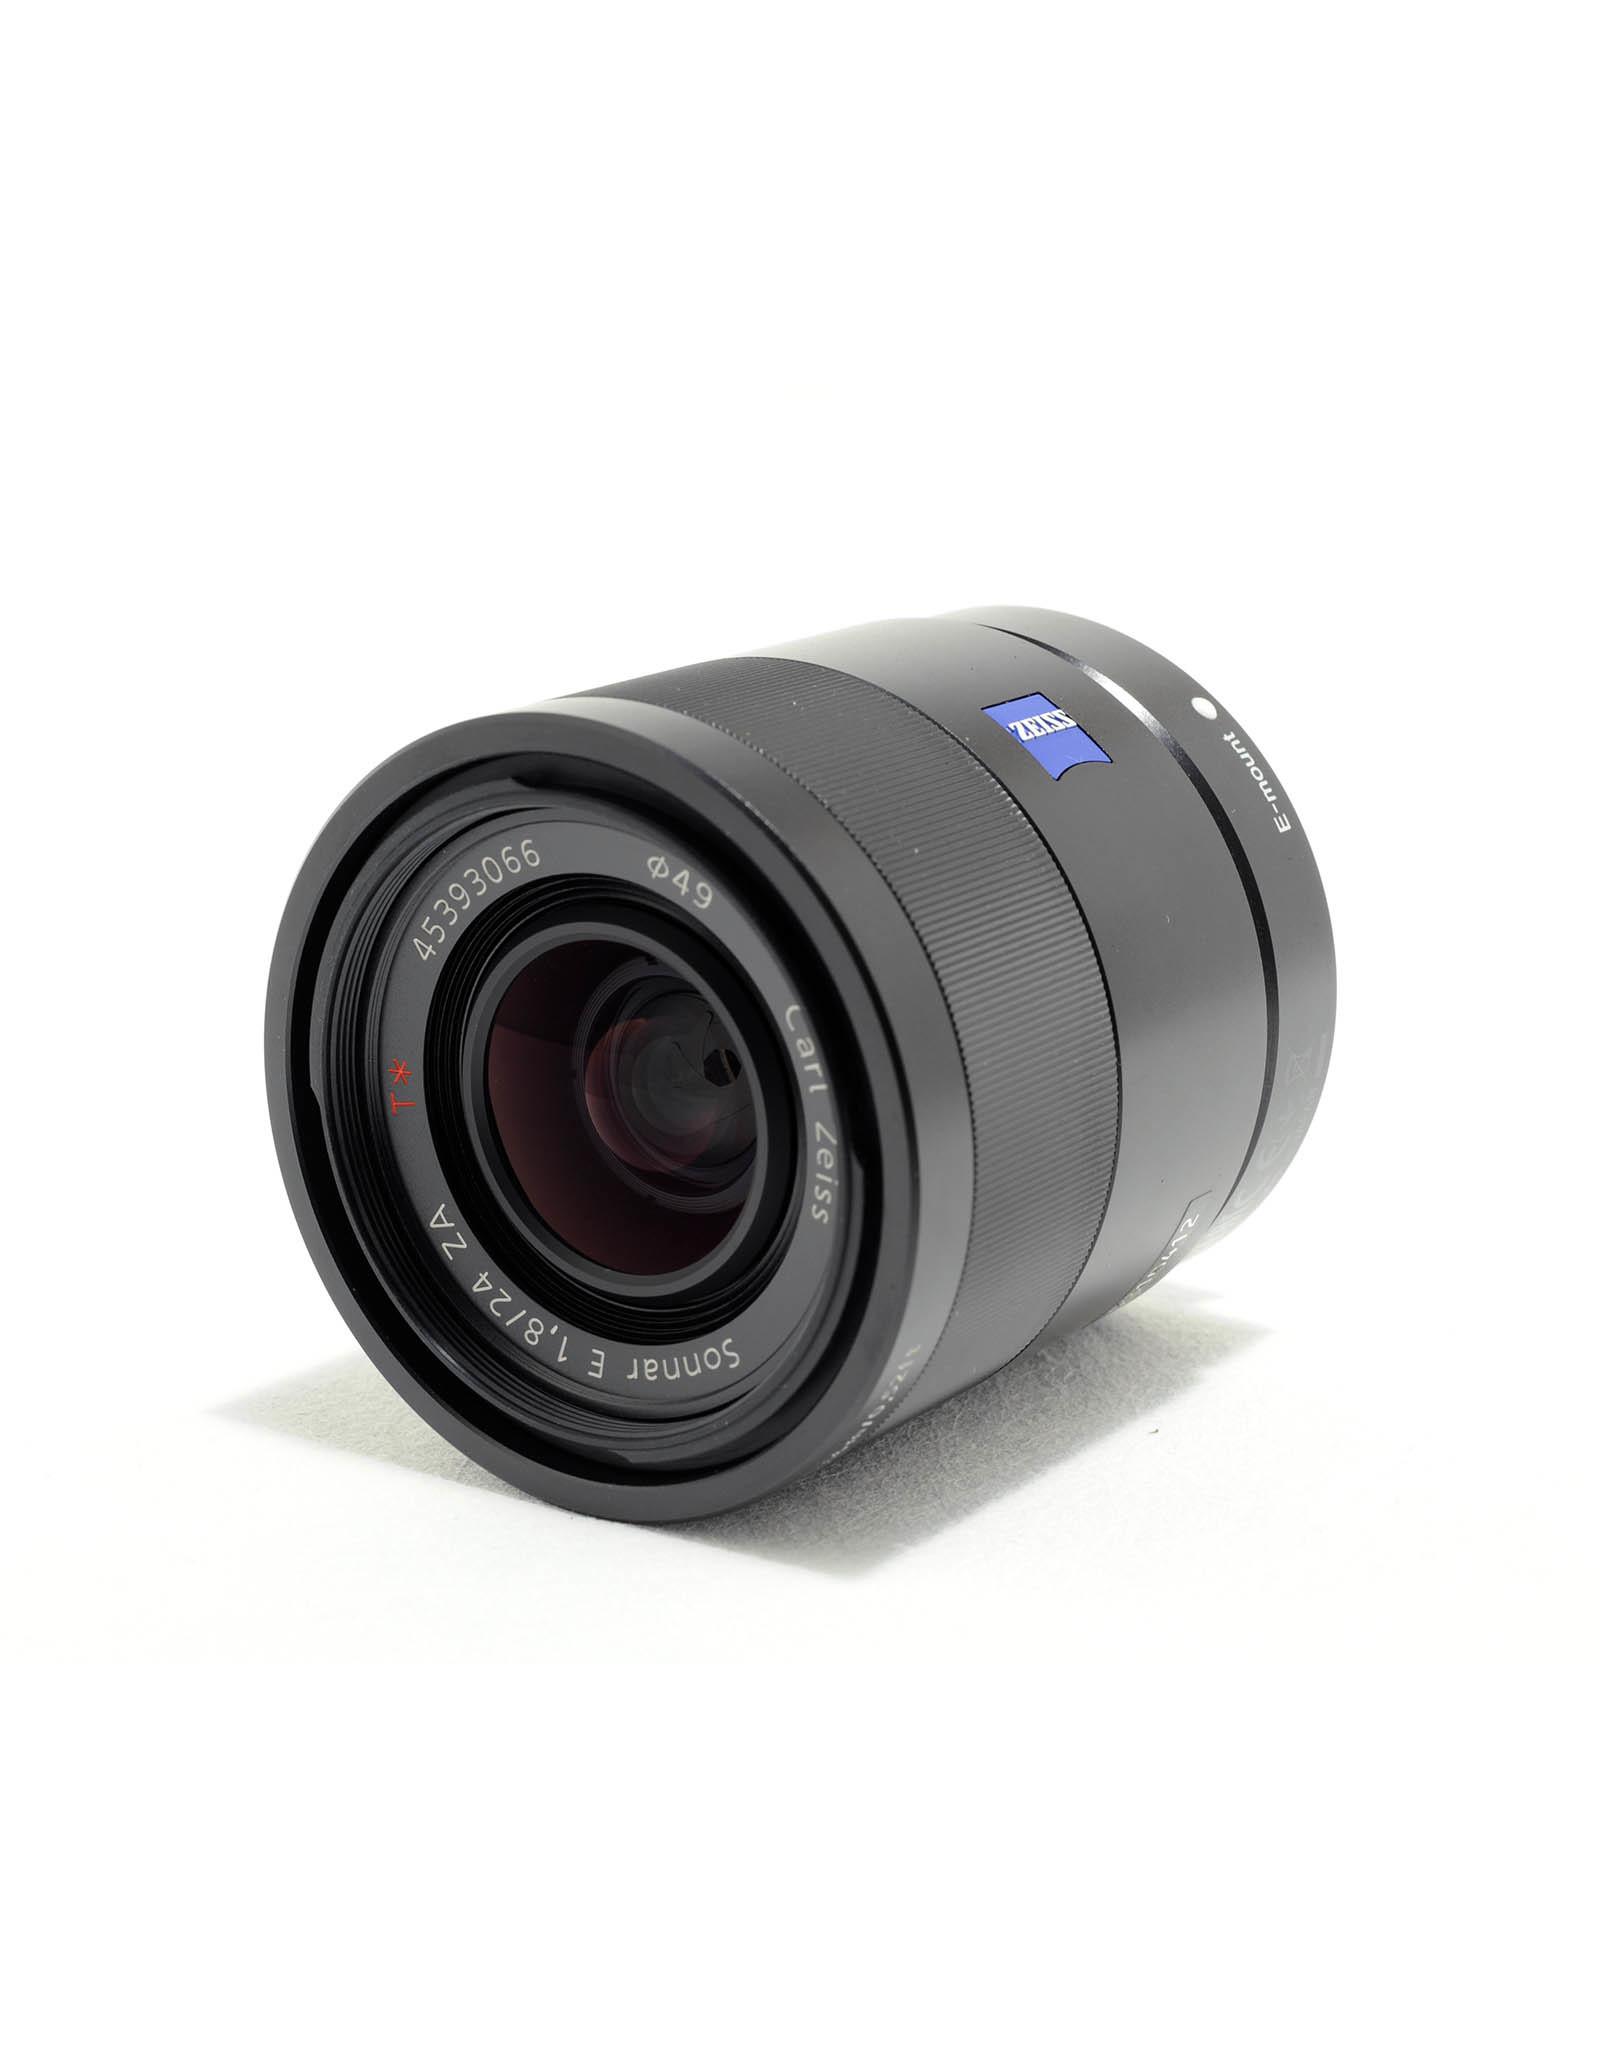 Zeiss Zeiss 24mm f1.8 Sonnar T* ZA E